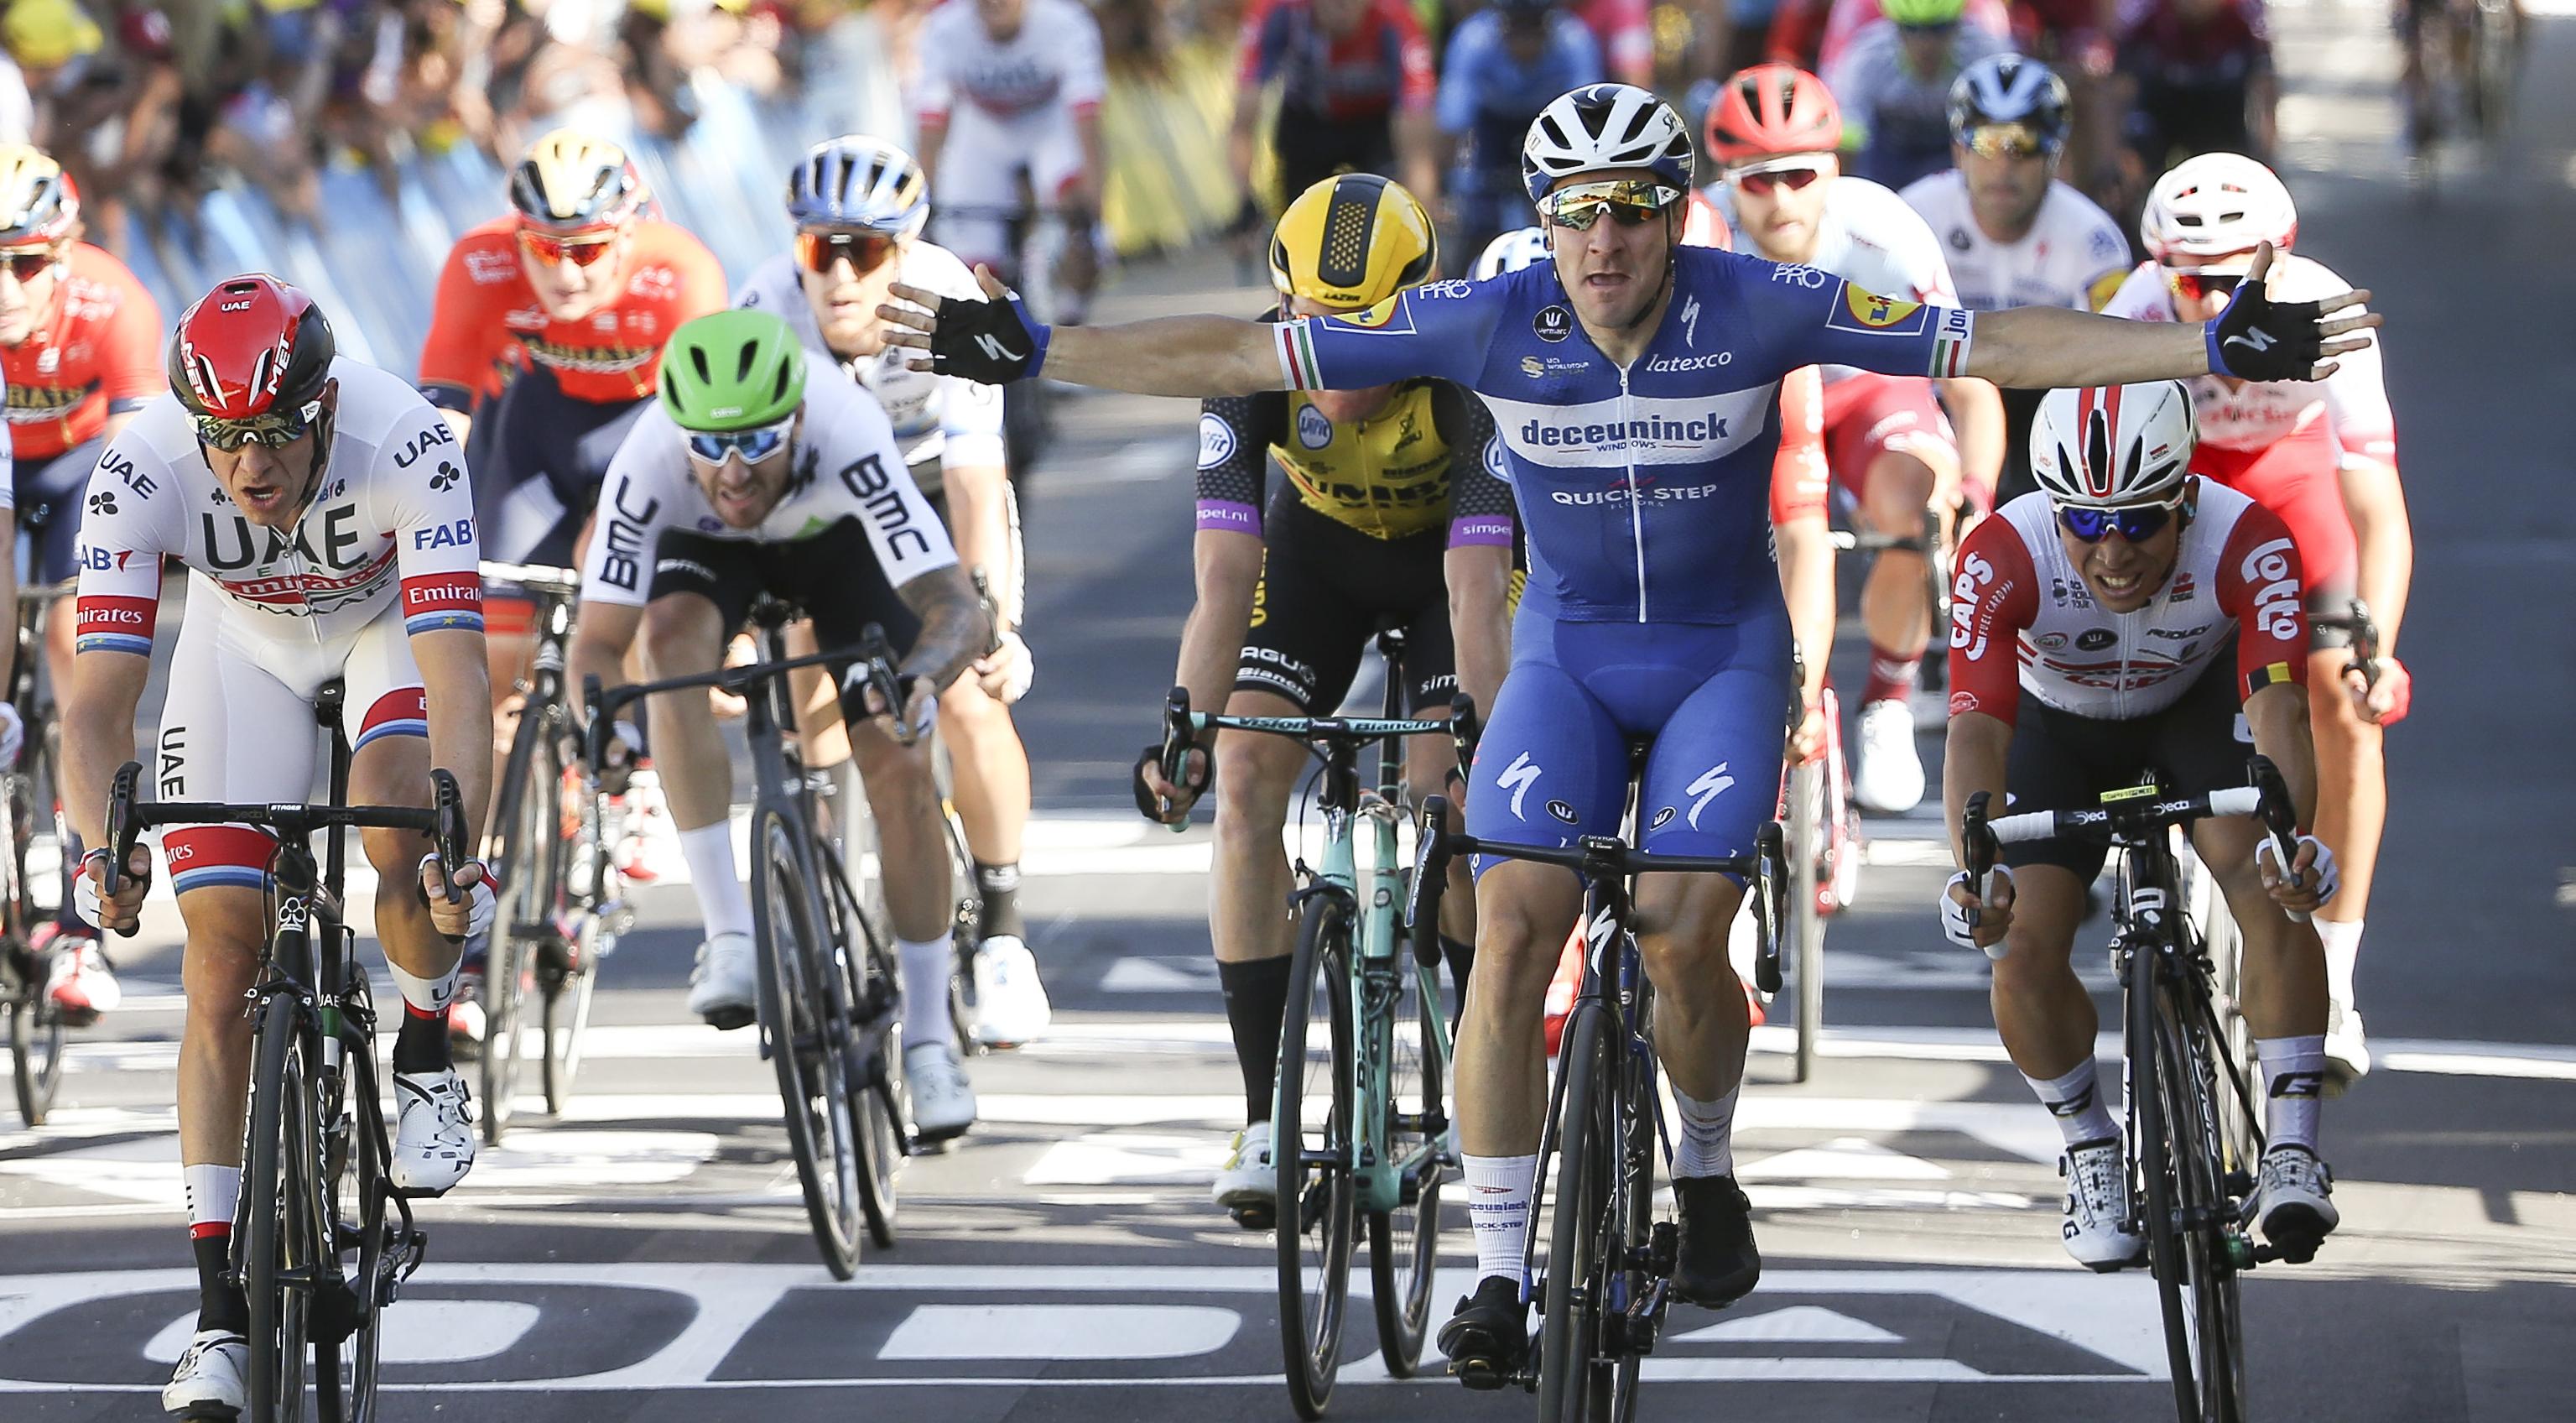 Tour de France 2019, tappa 10: duello Viviani-Groenewegen?